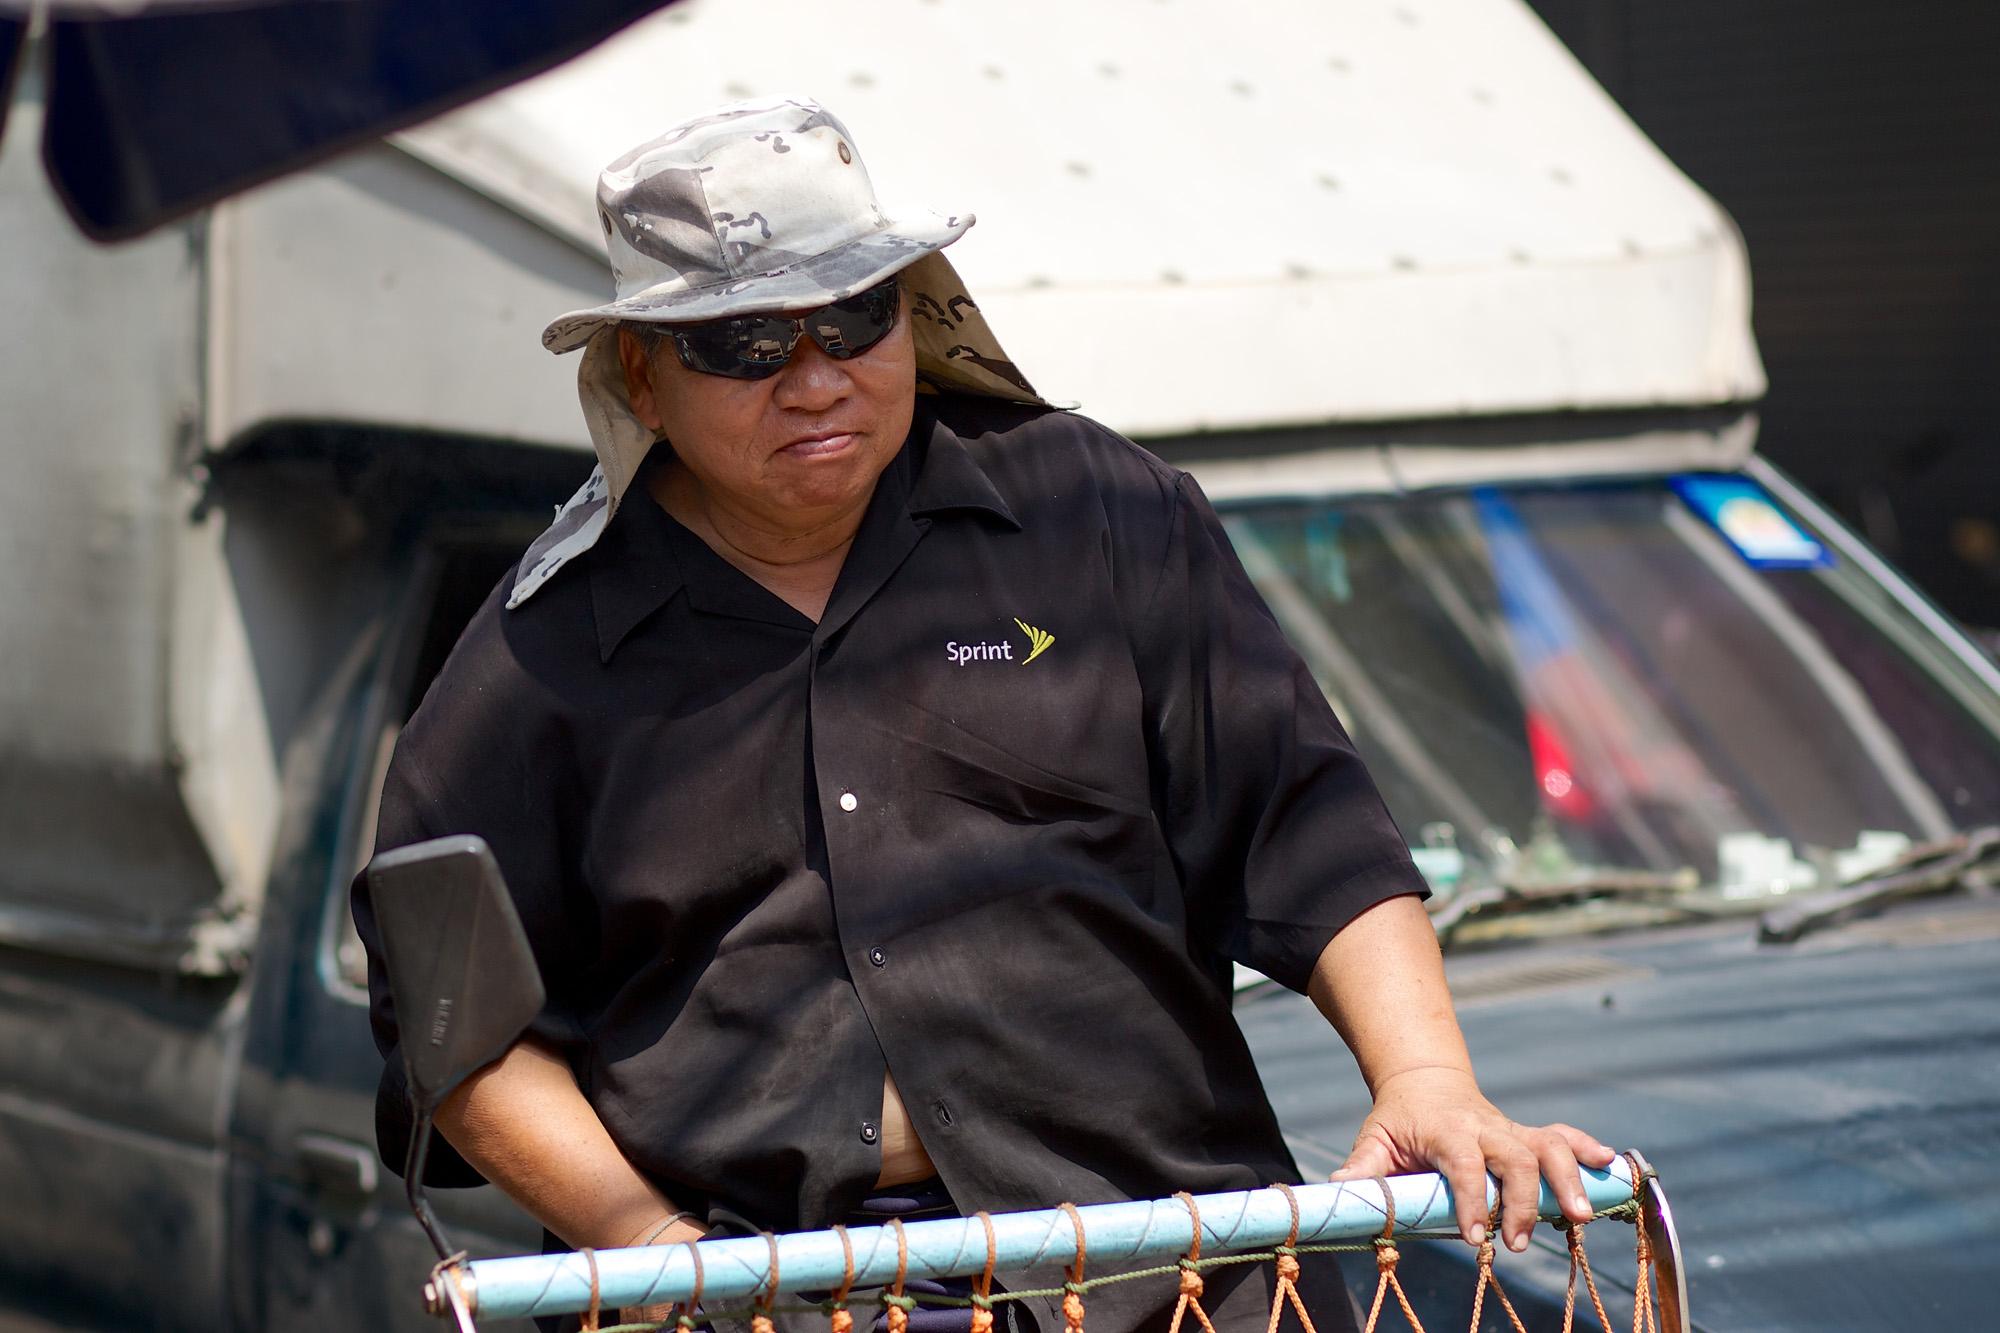 workman pushing a cart